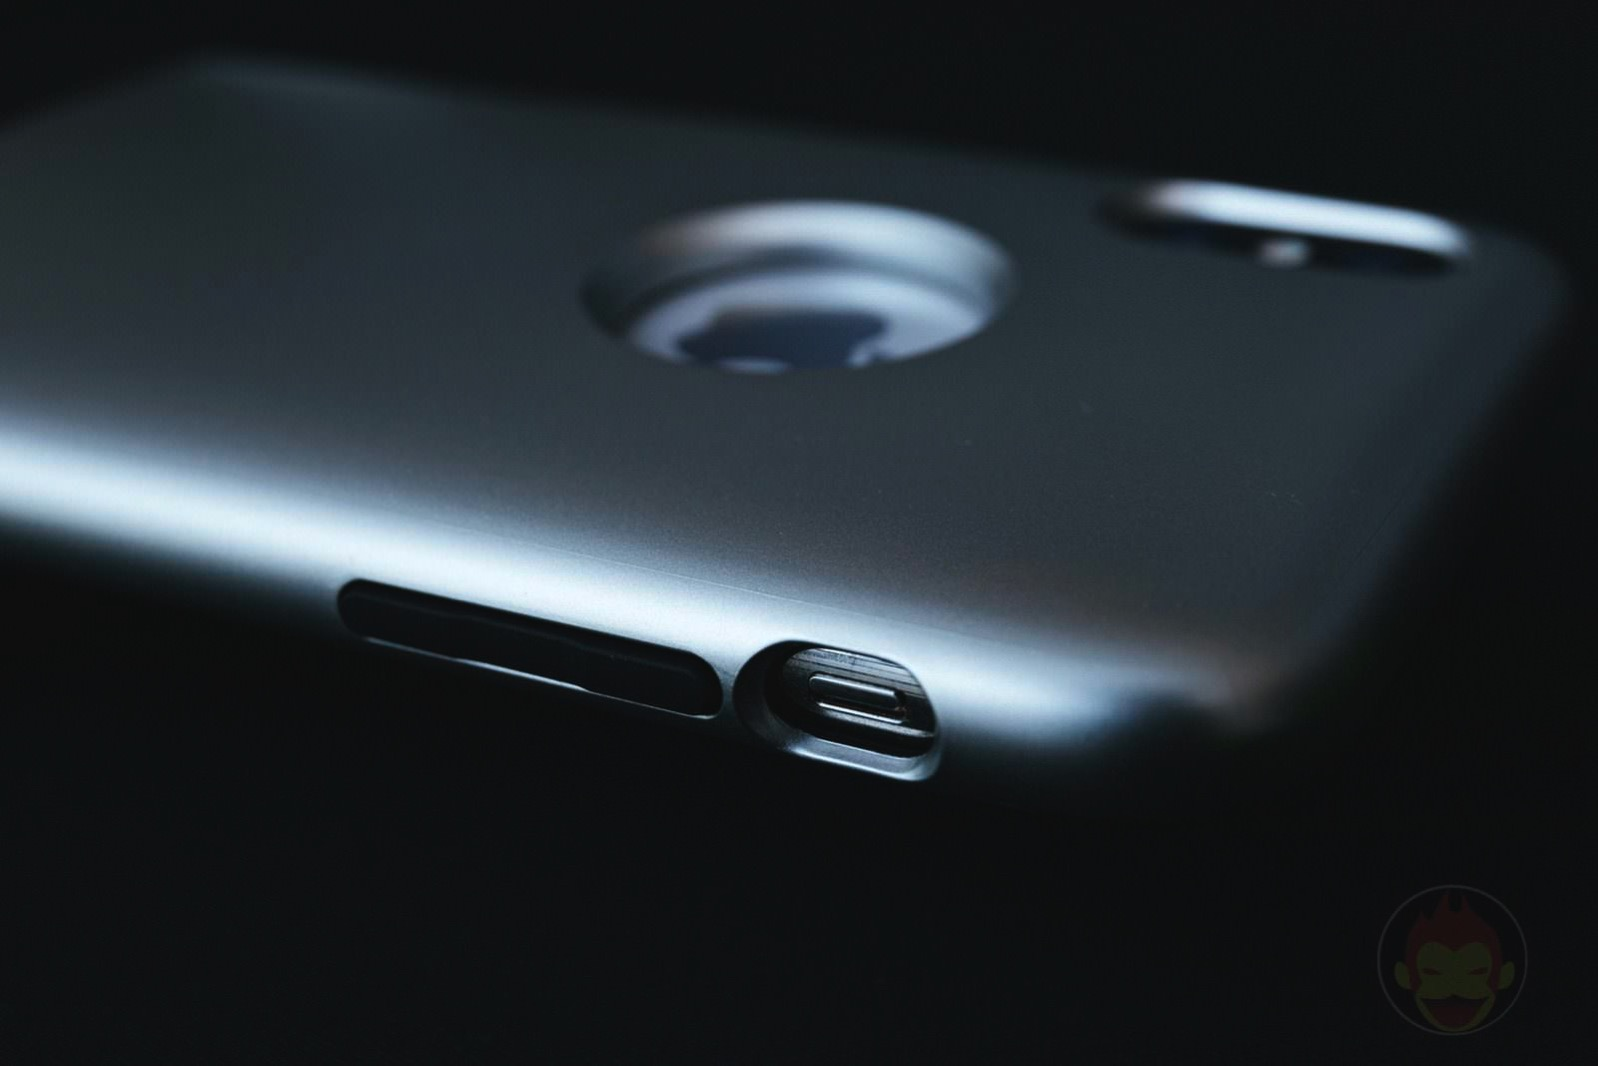 Spigen-iPhoenX-Case-Classic-One-04.jpg